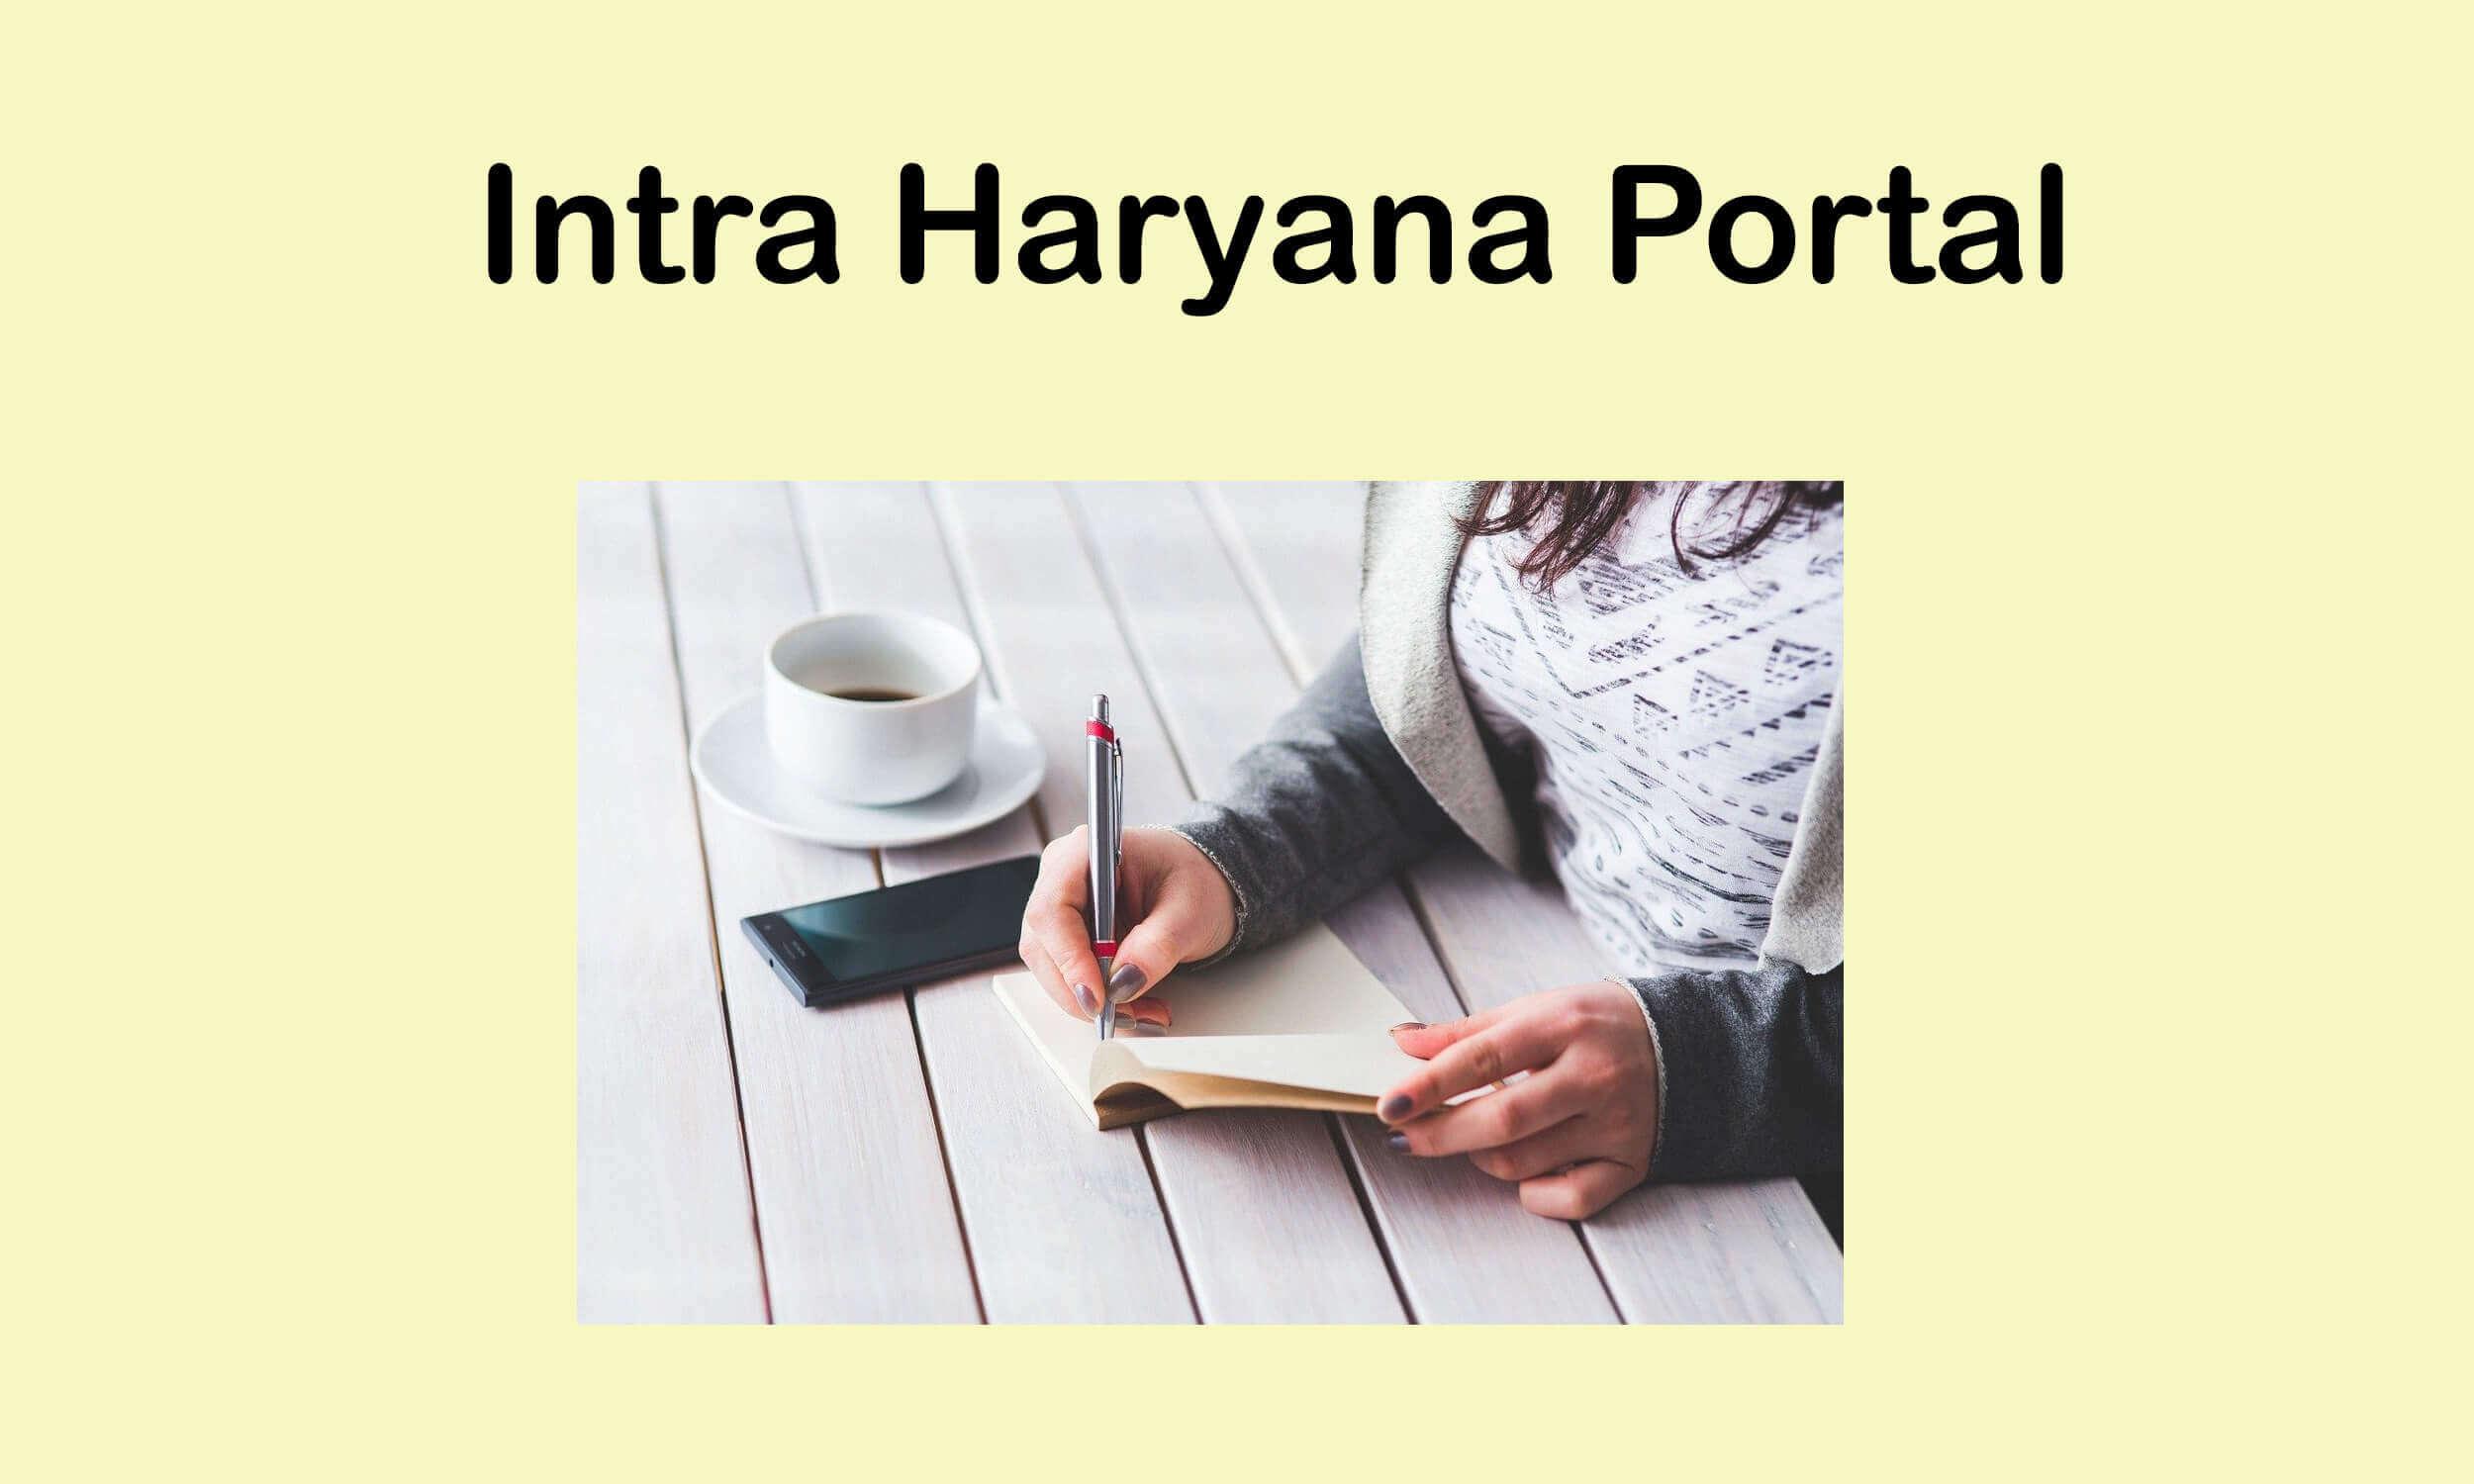 Intra Haryana